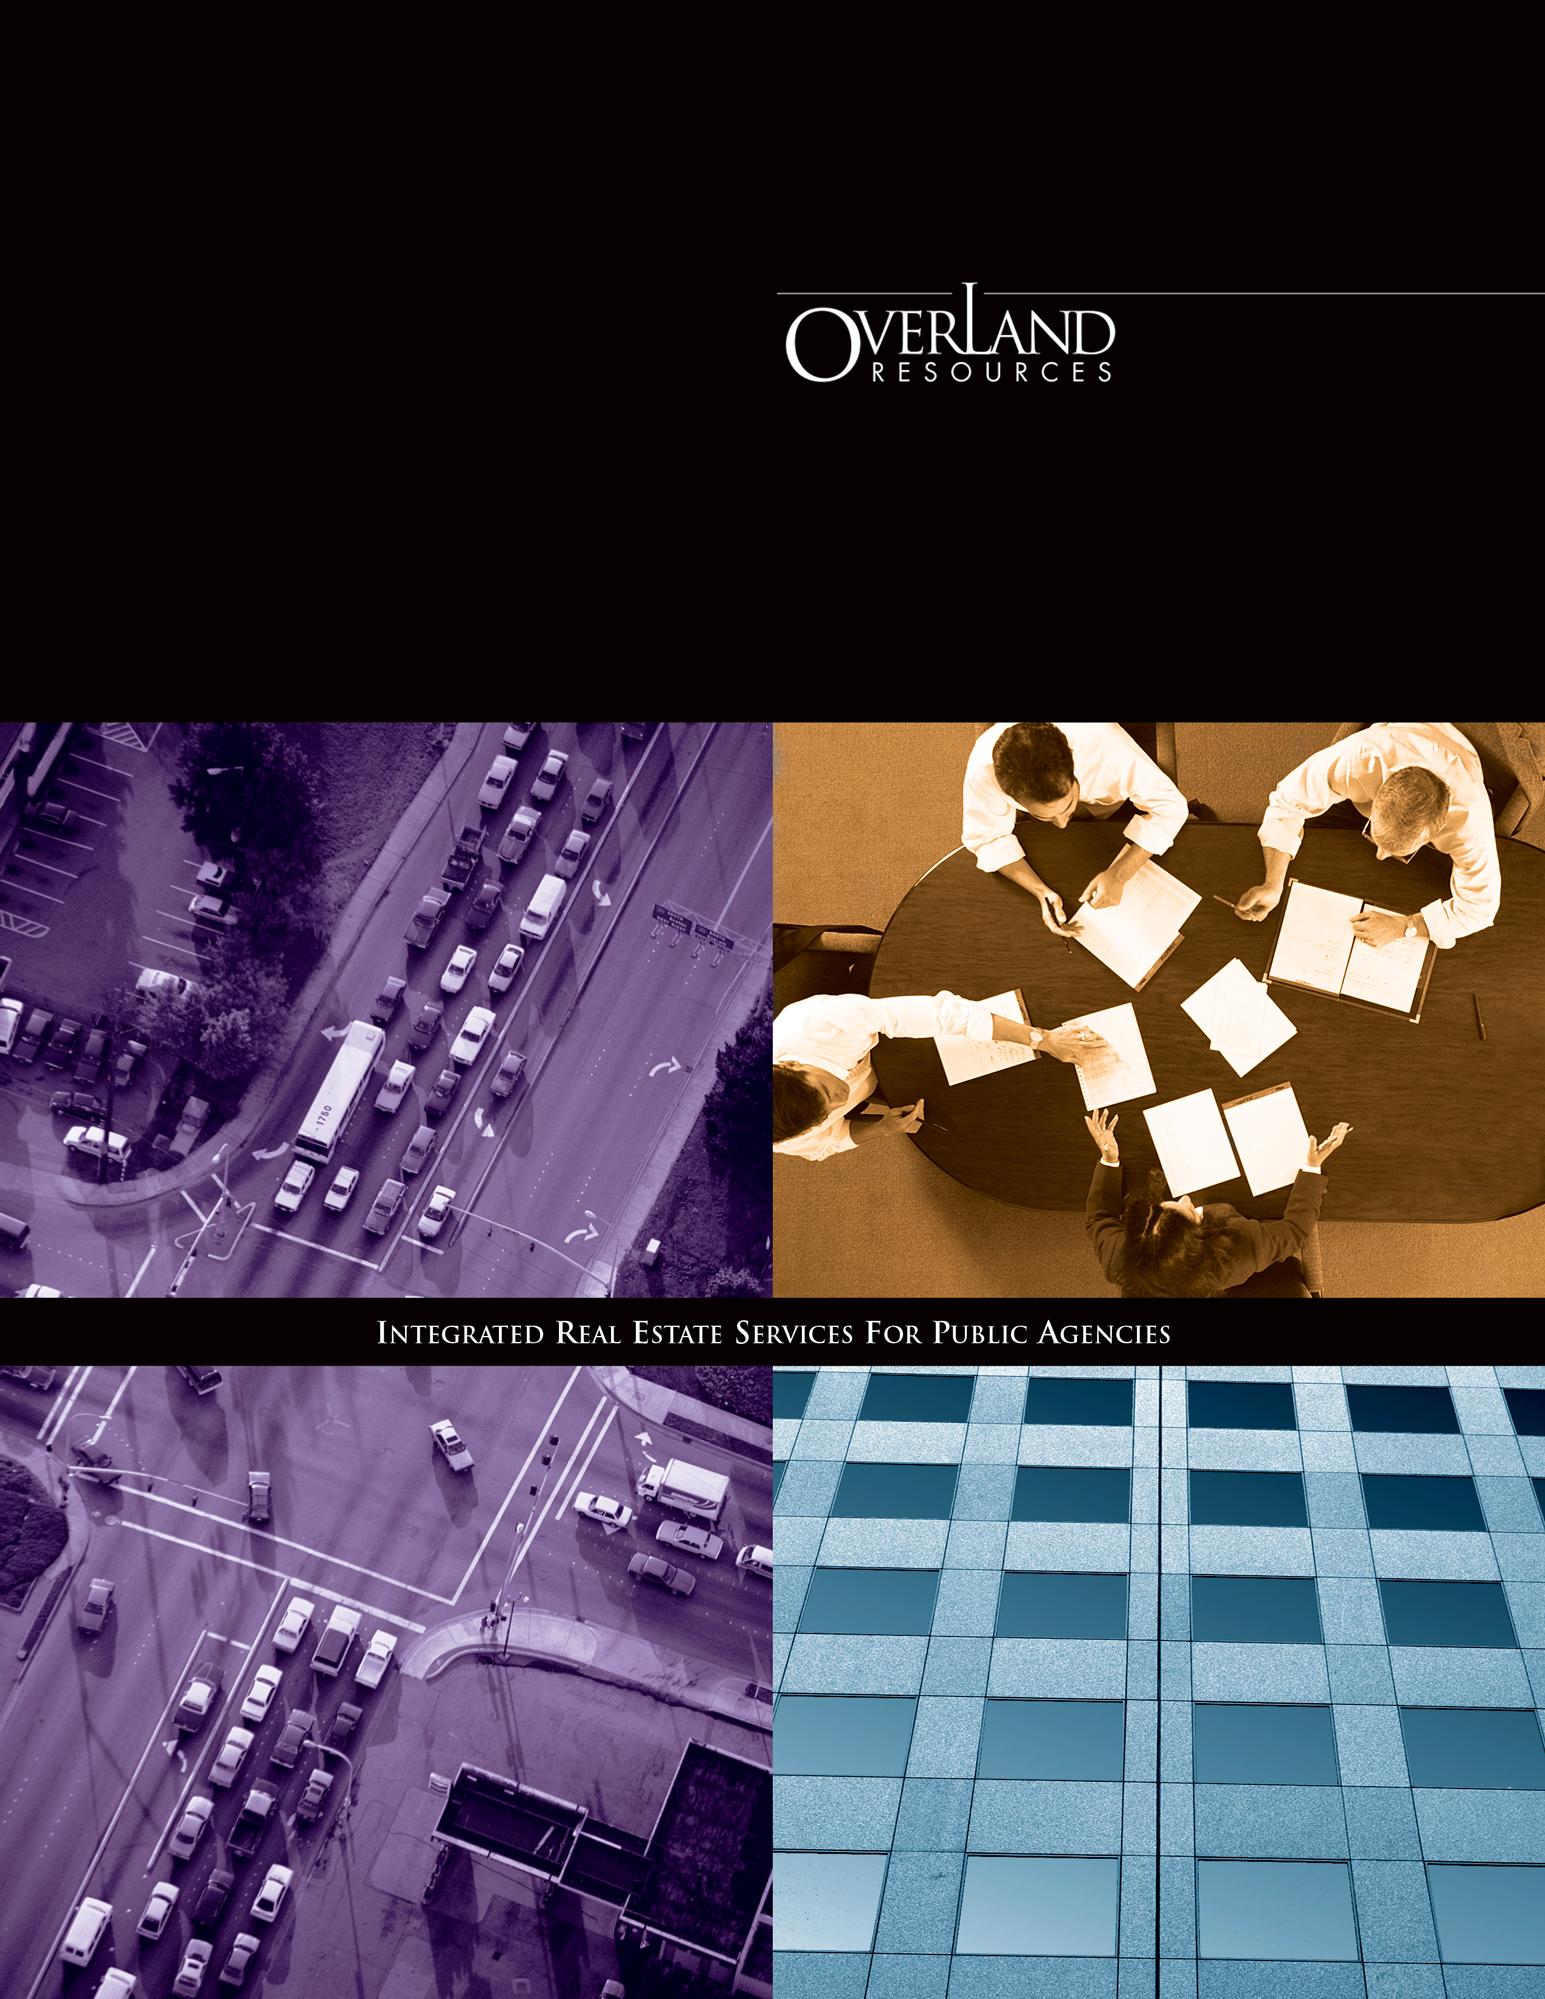 OverlandBroc-1.jpg